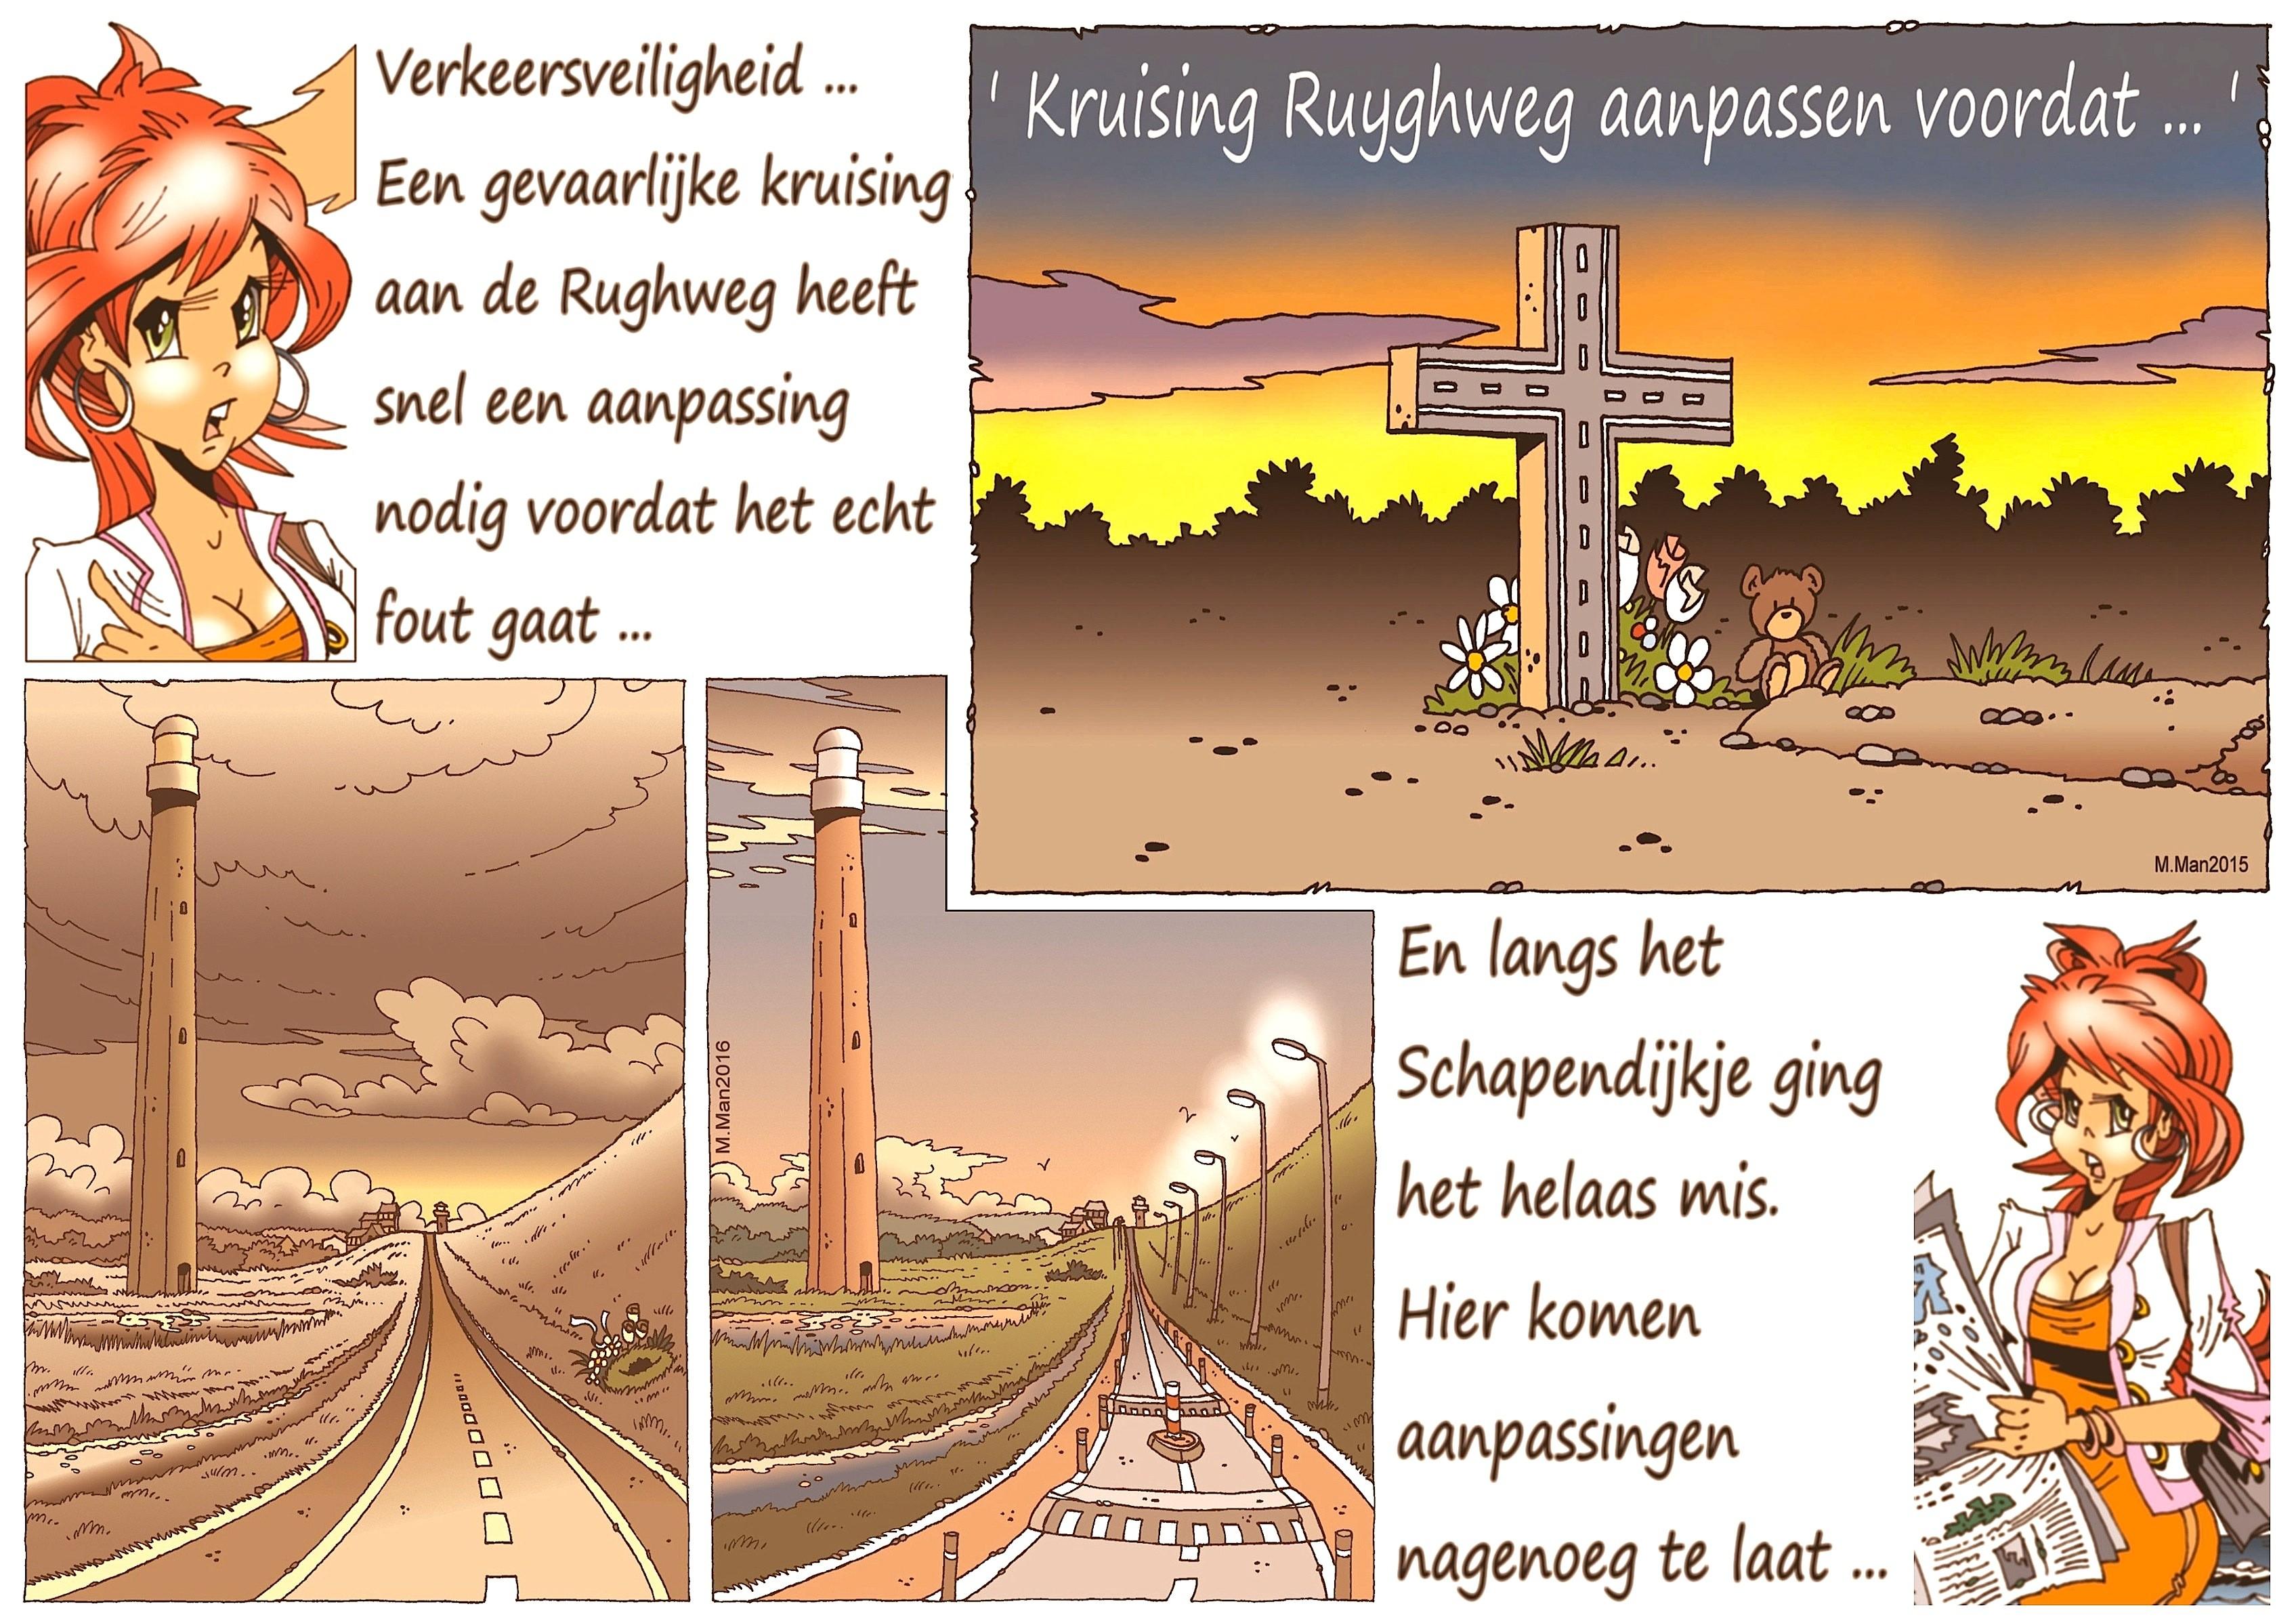 Martin Man – Sofietje's Helders Weekblad Cartoon-Chronicles (27): Verkeersveiligheid